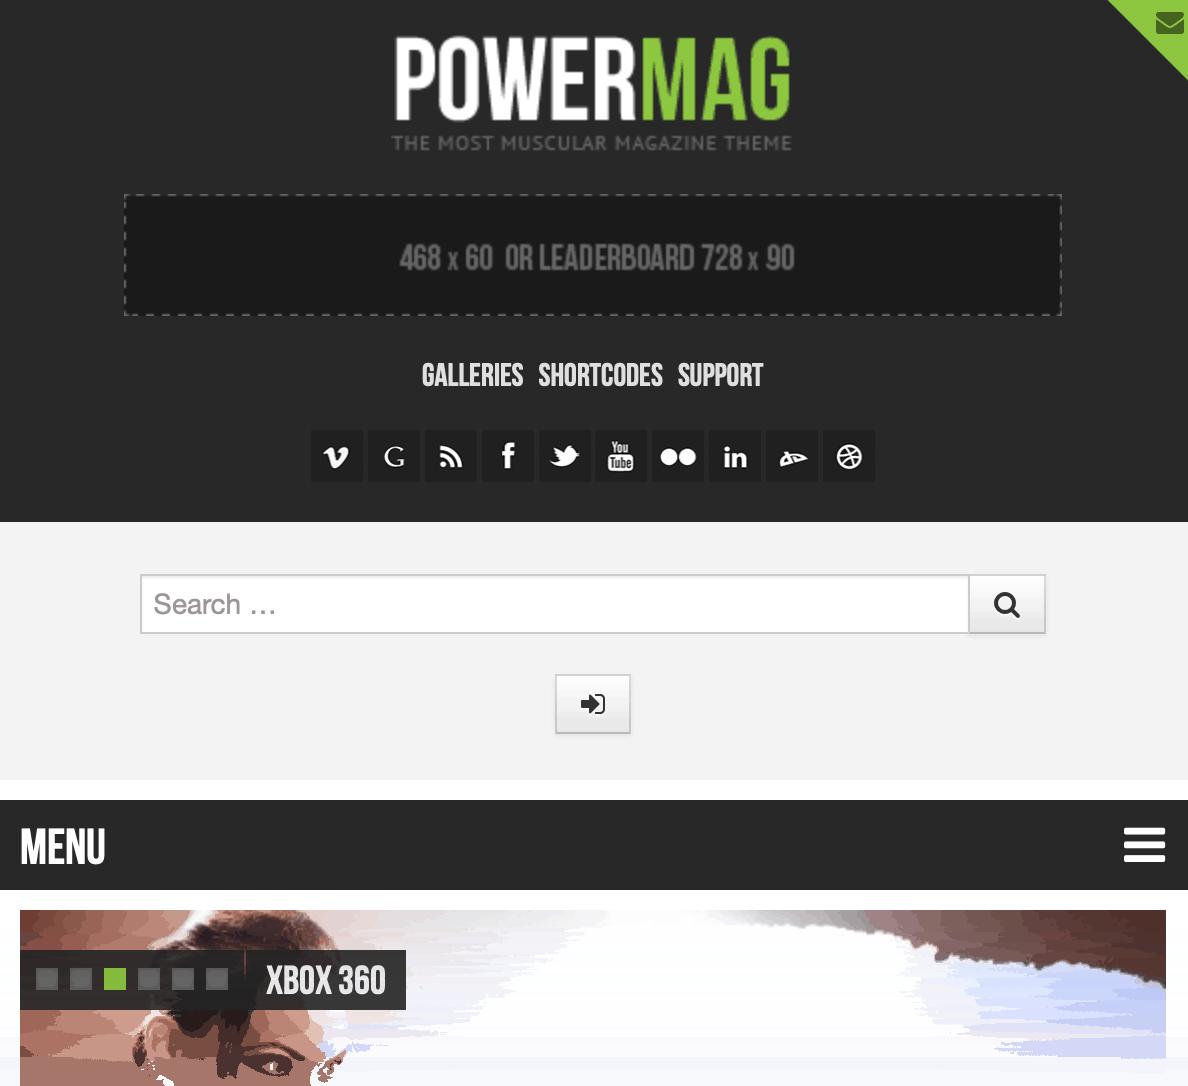 PowerMag Theme Preview